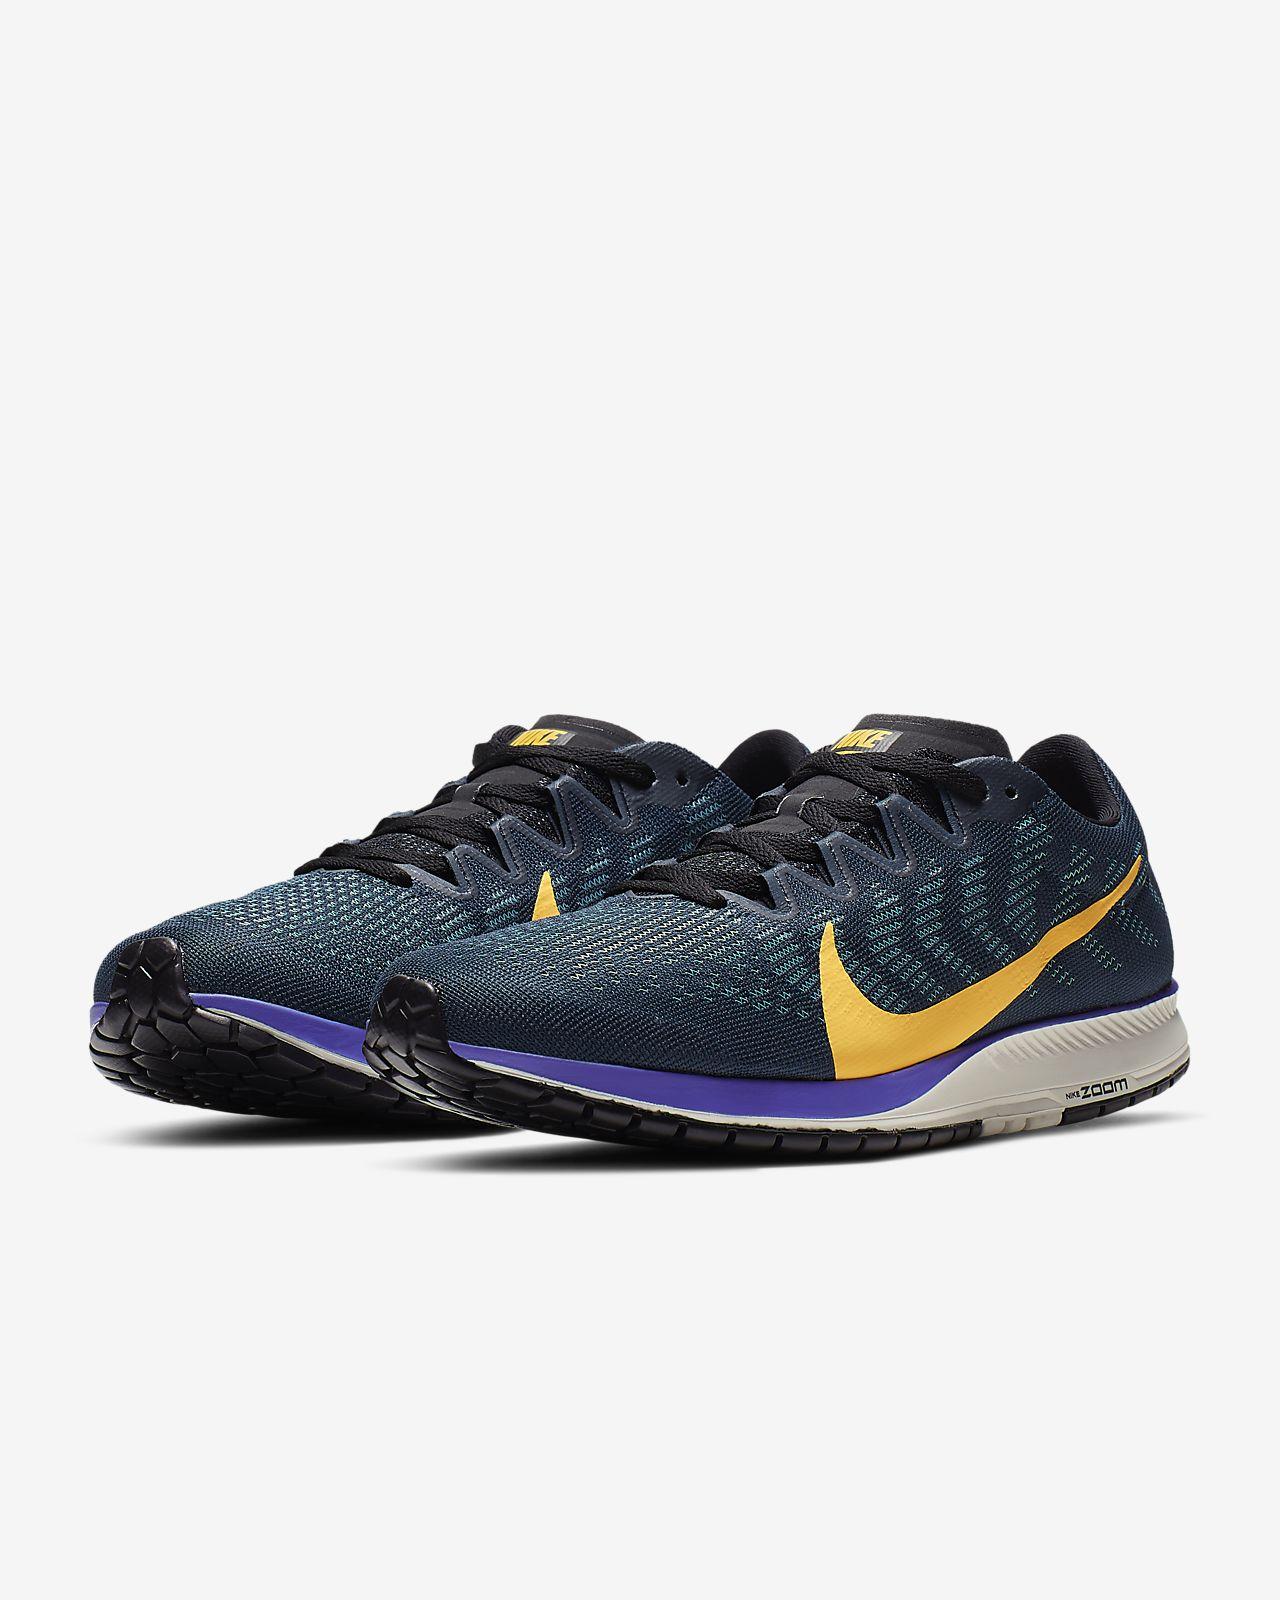 online retailer 53bc0 b3beb ... Nike Air Zoom Streak 7 Running Shoe